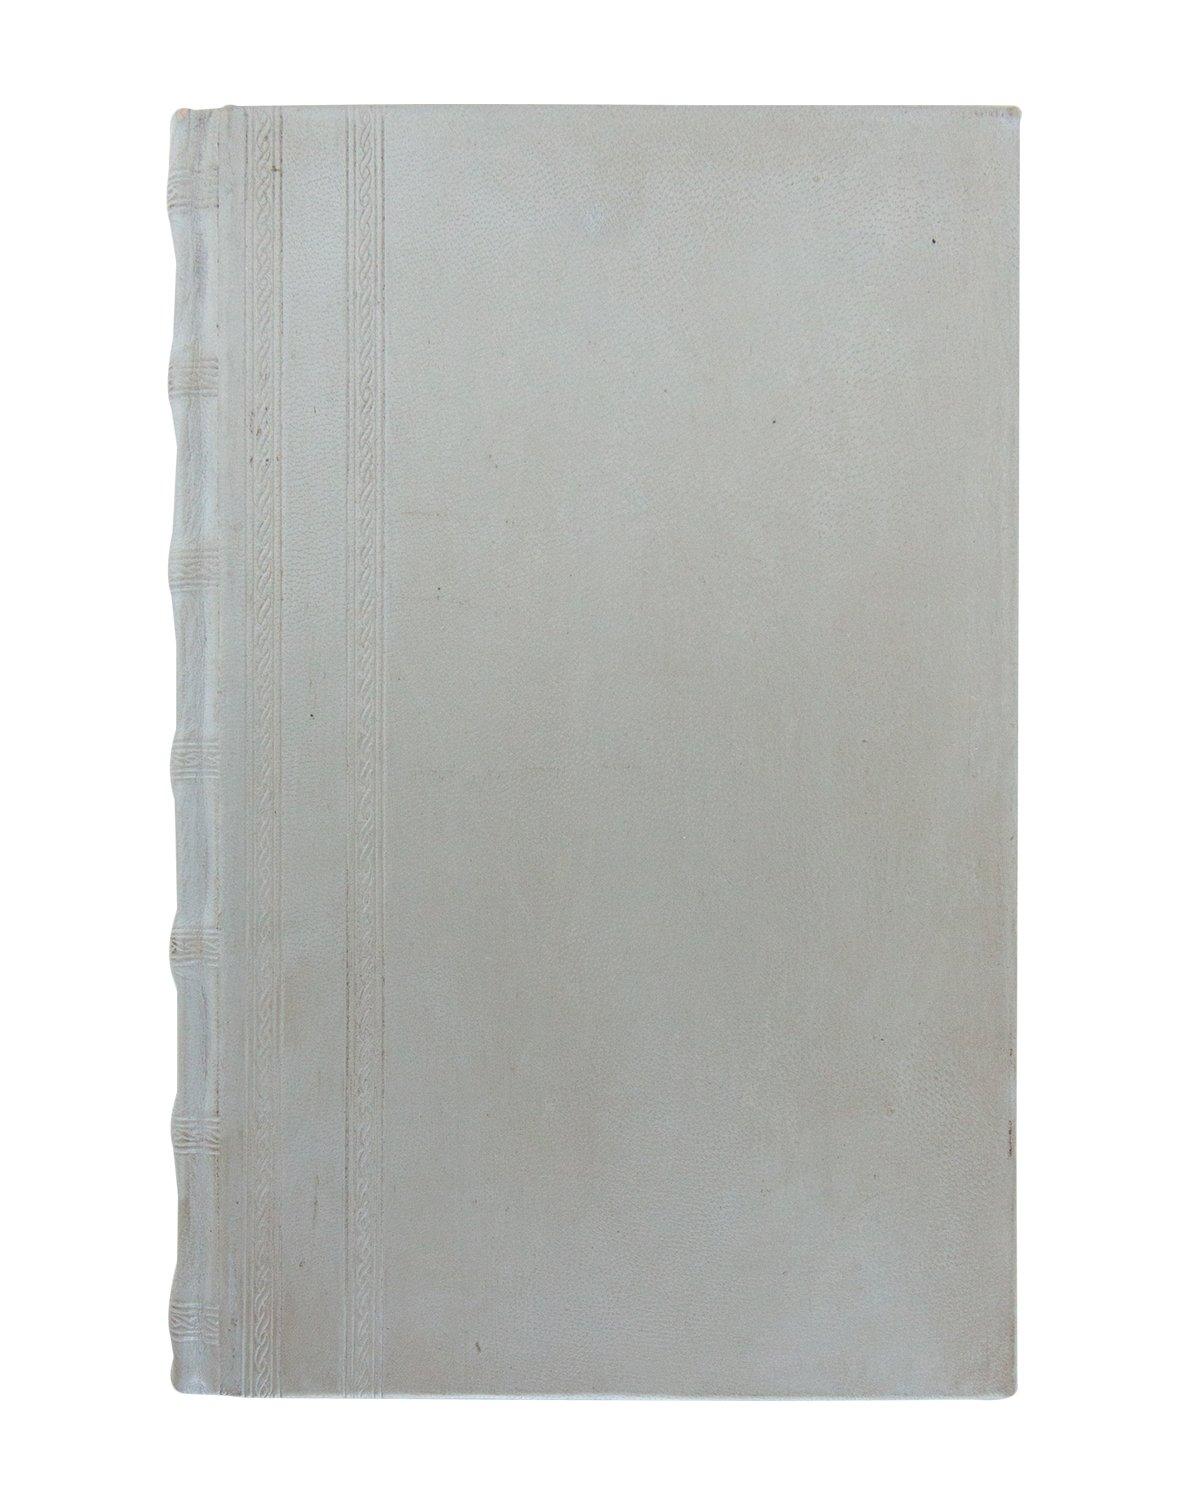 Scroll_Spine_Book.jpg